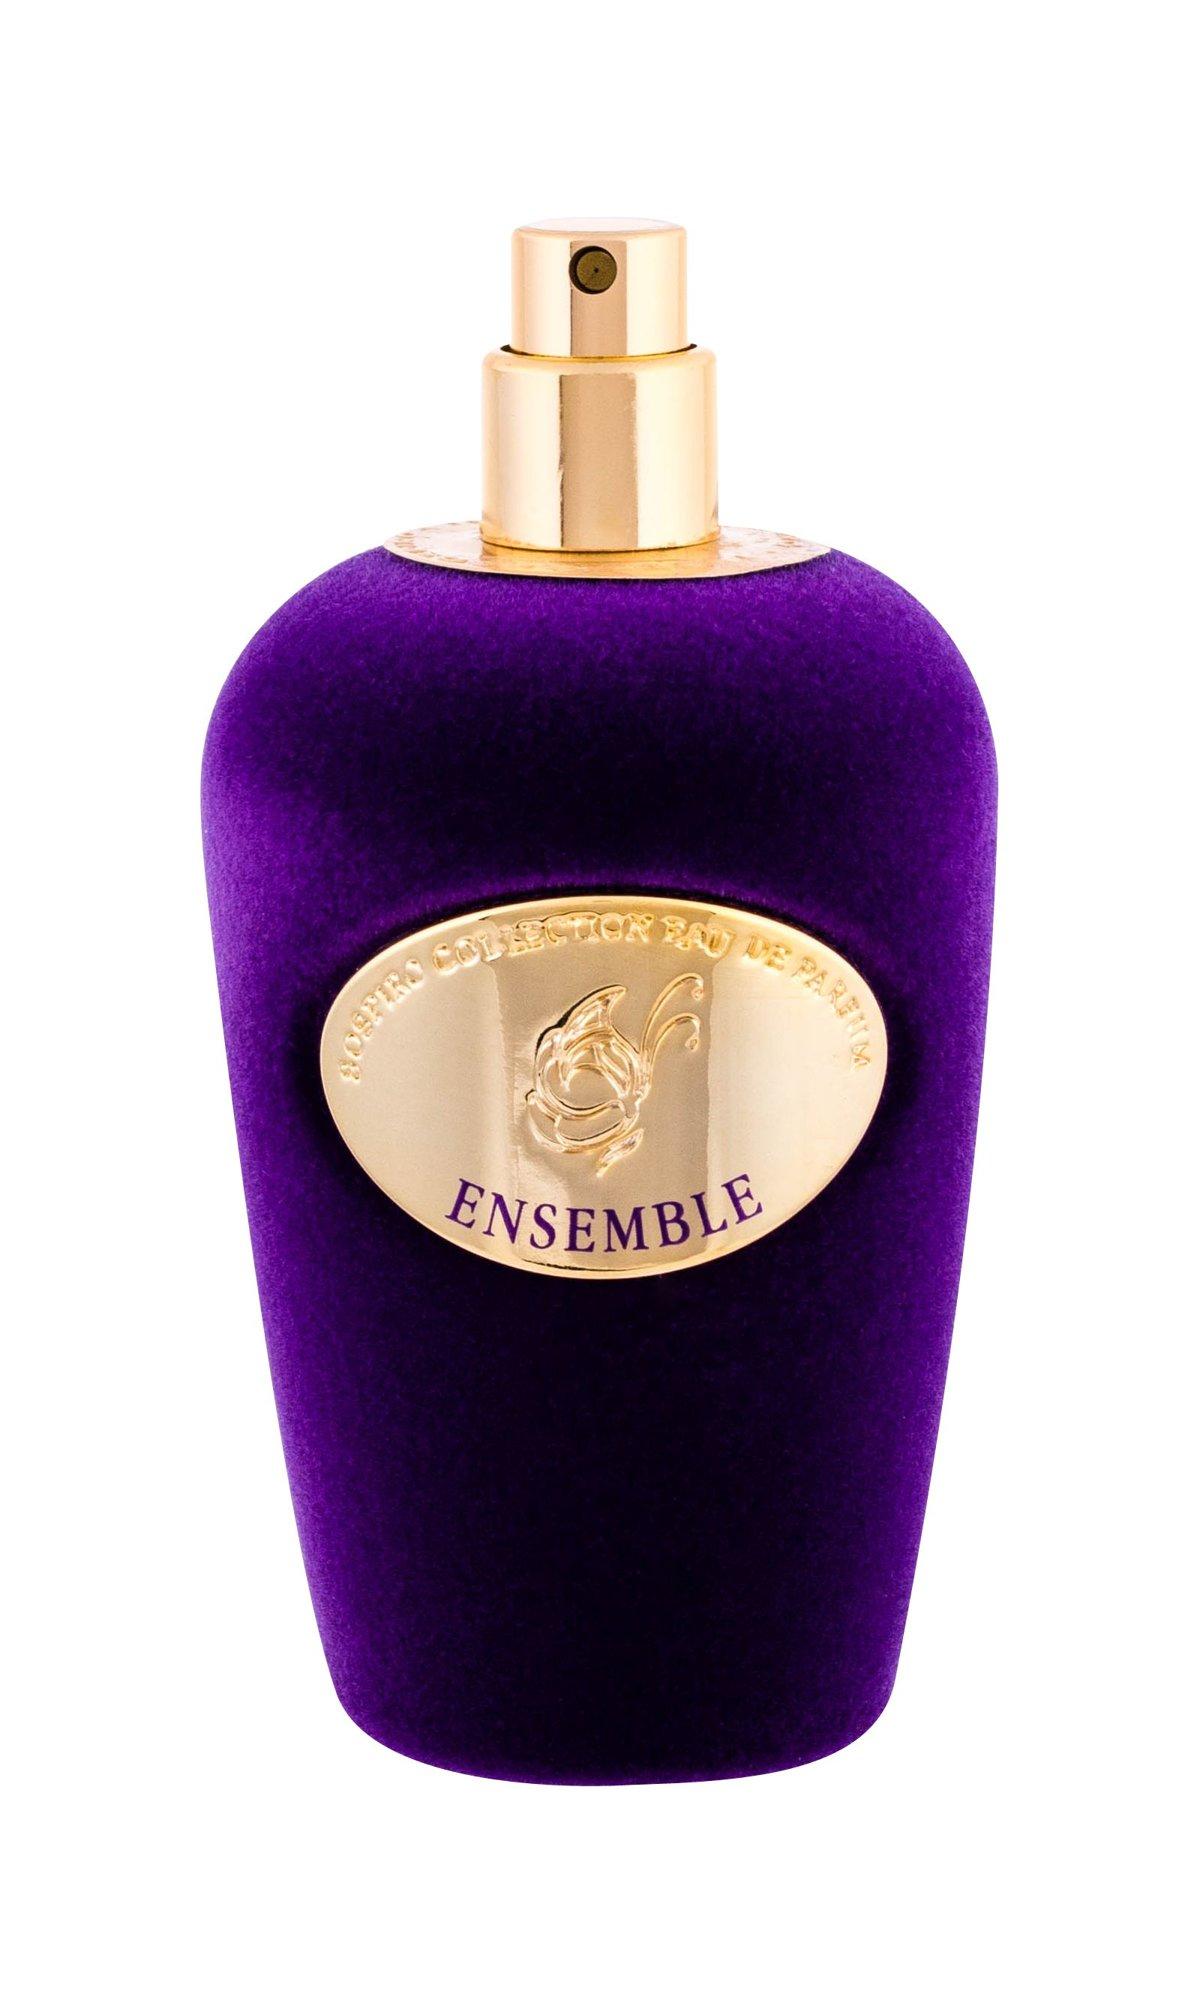 Sospiro Ensemble Eau de Parfum 100ml